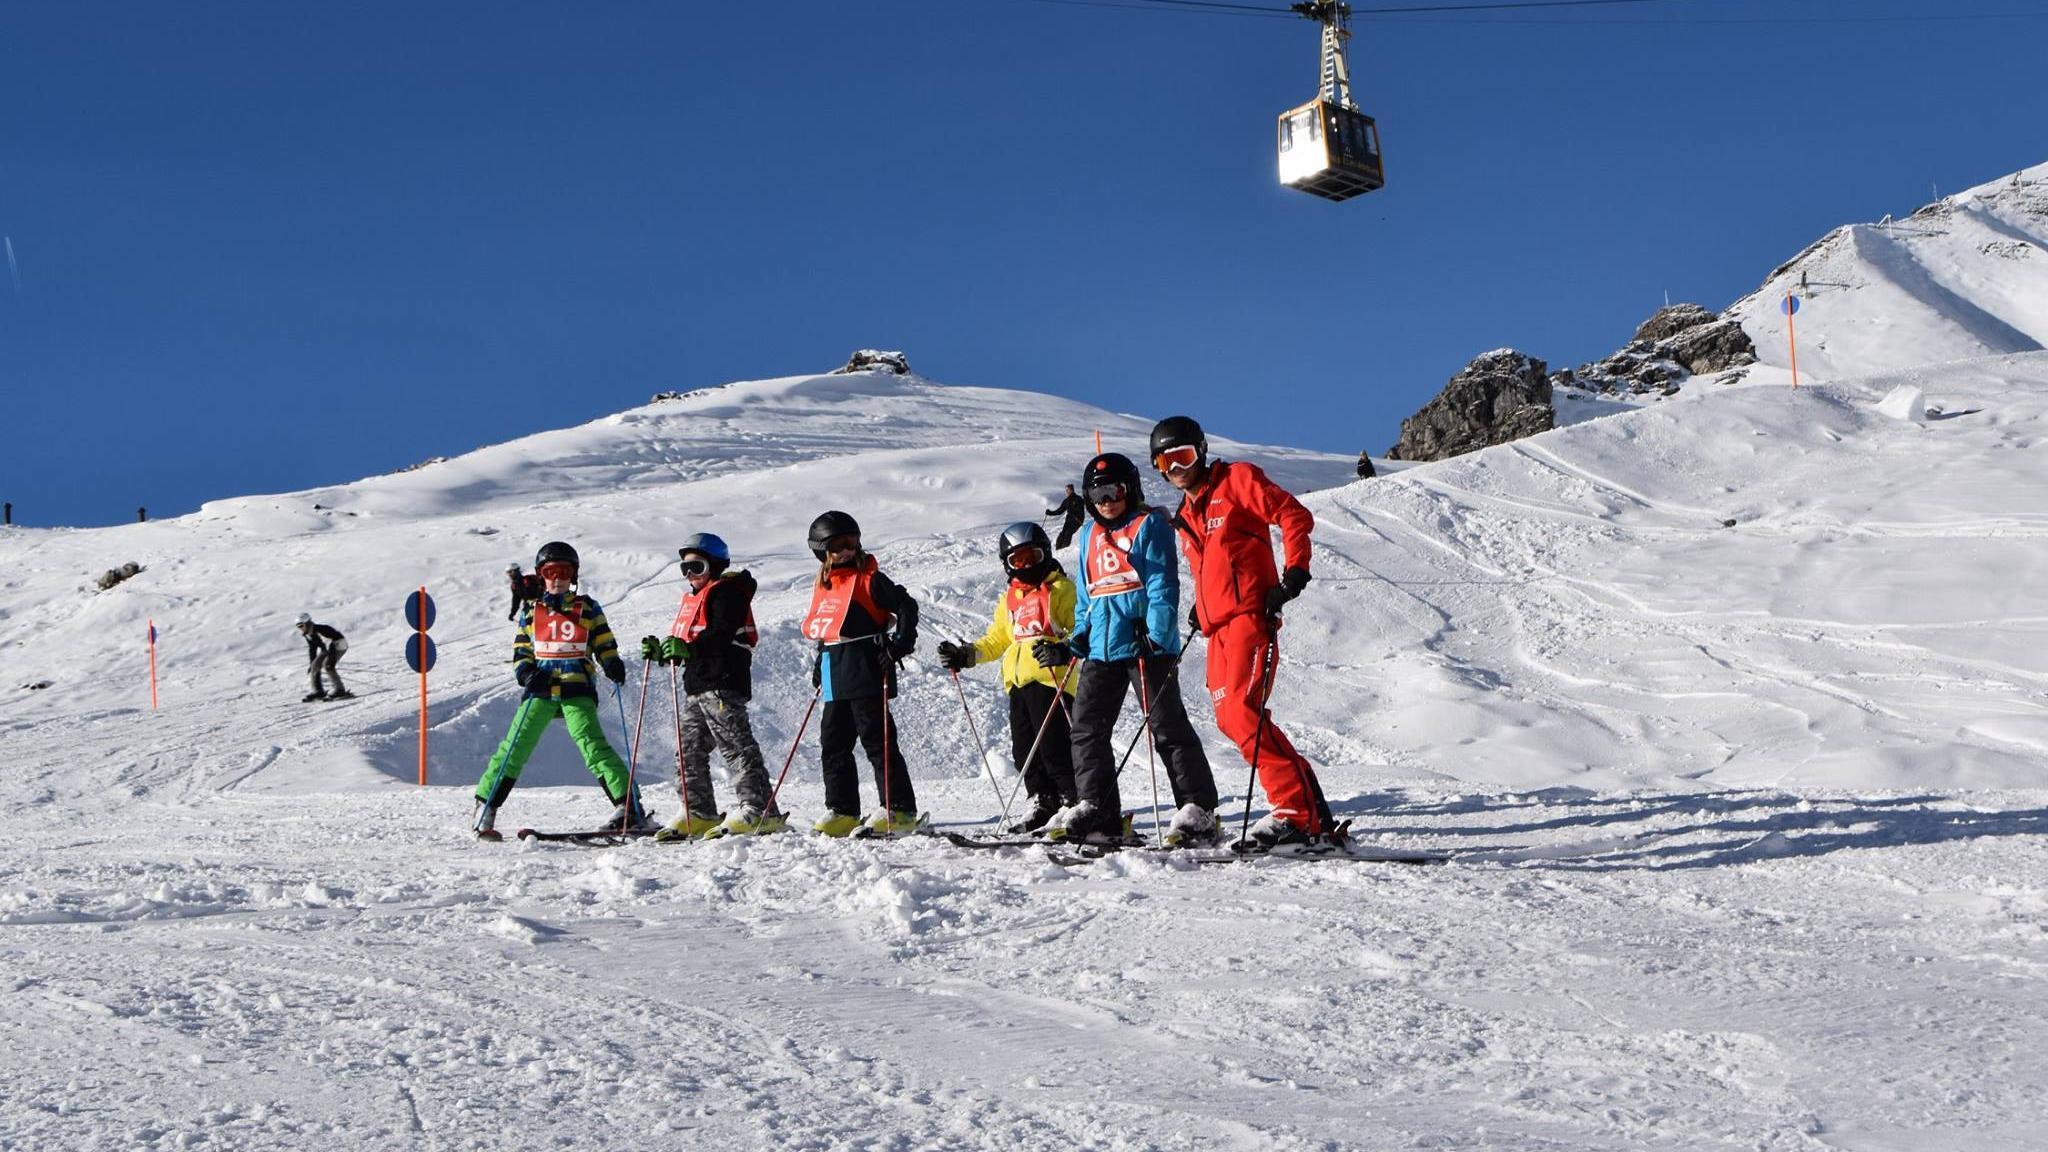 Kids Ski Lessons 9 16 Years All Levels Neue Skischule Oberstdorf